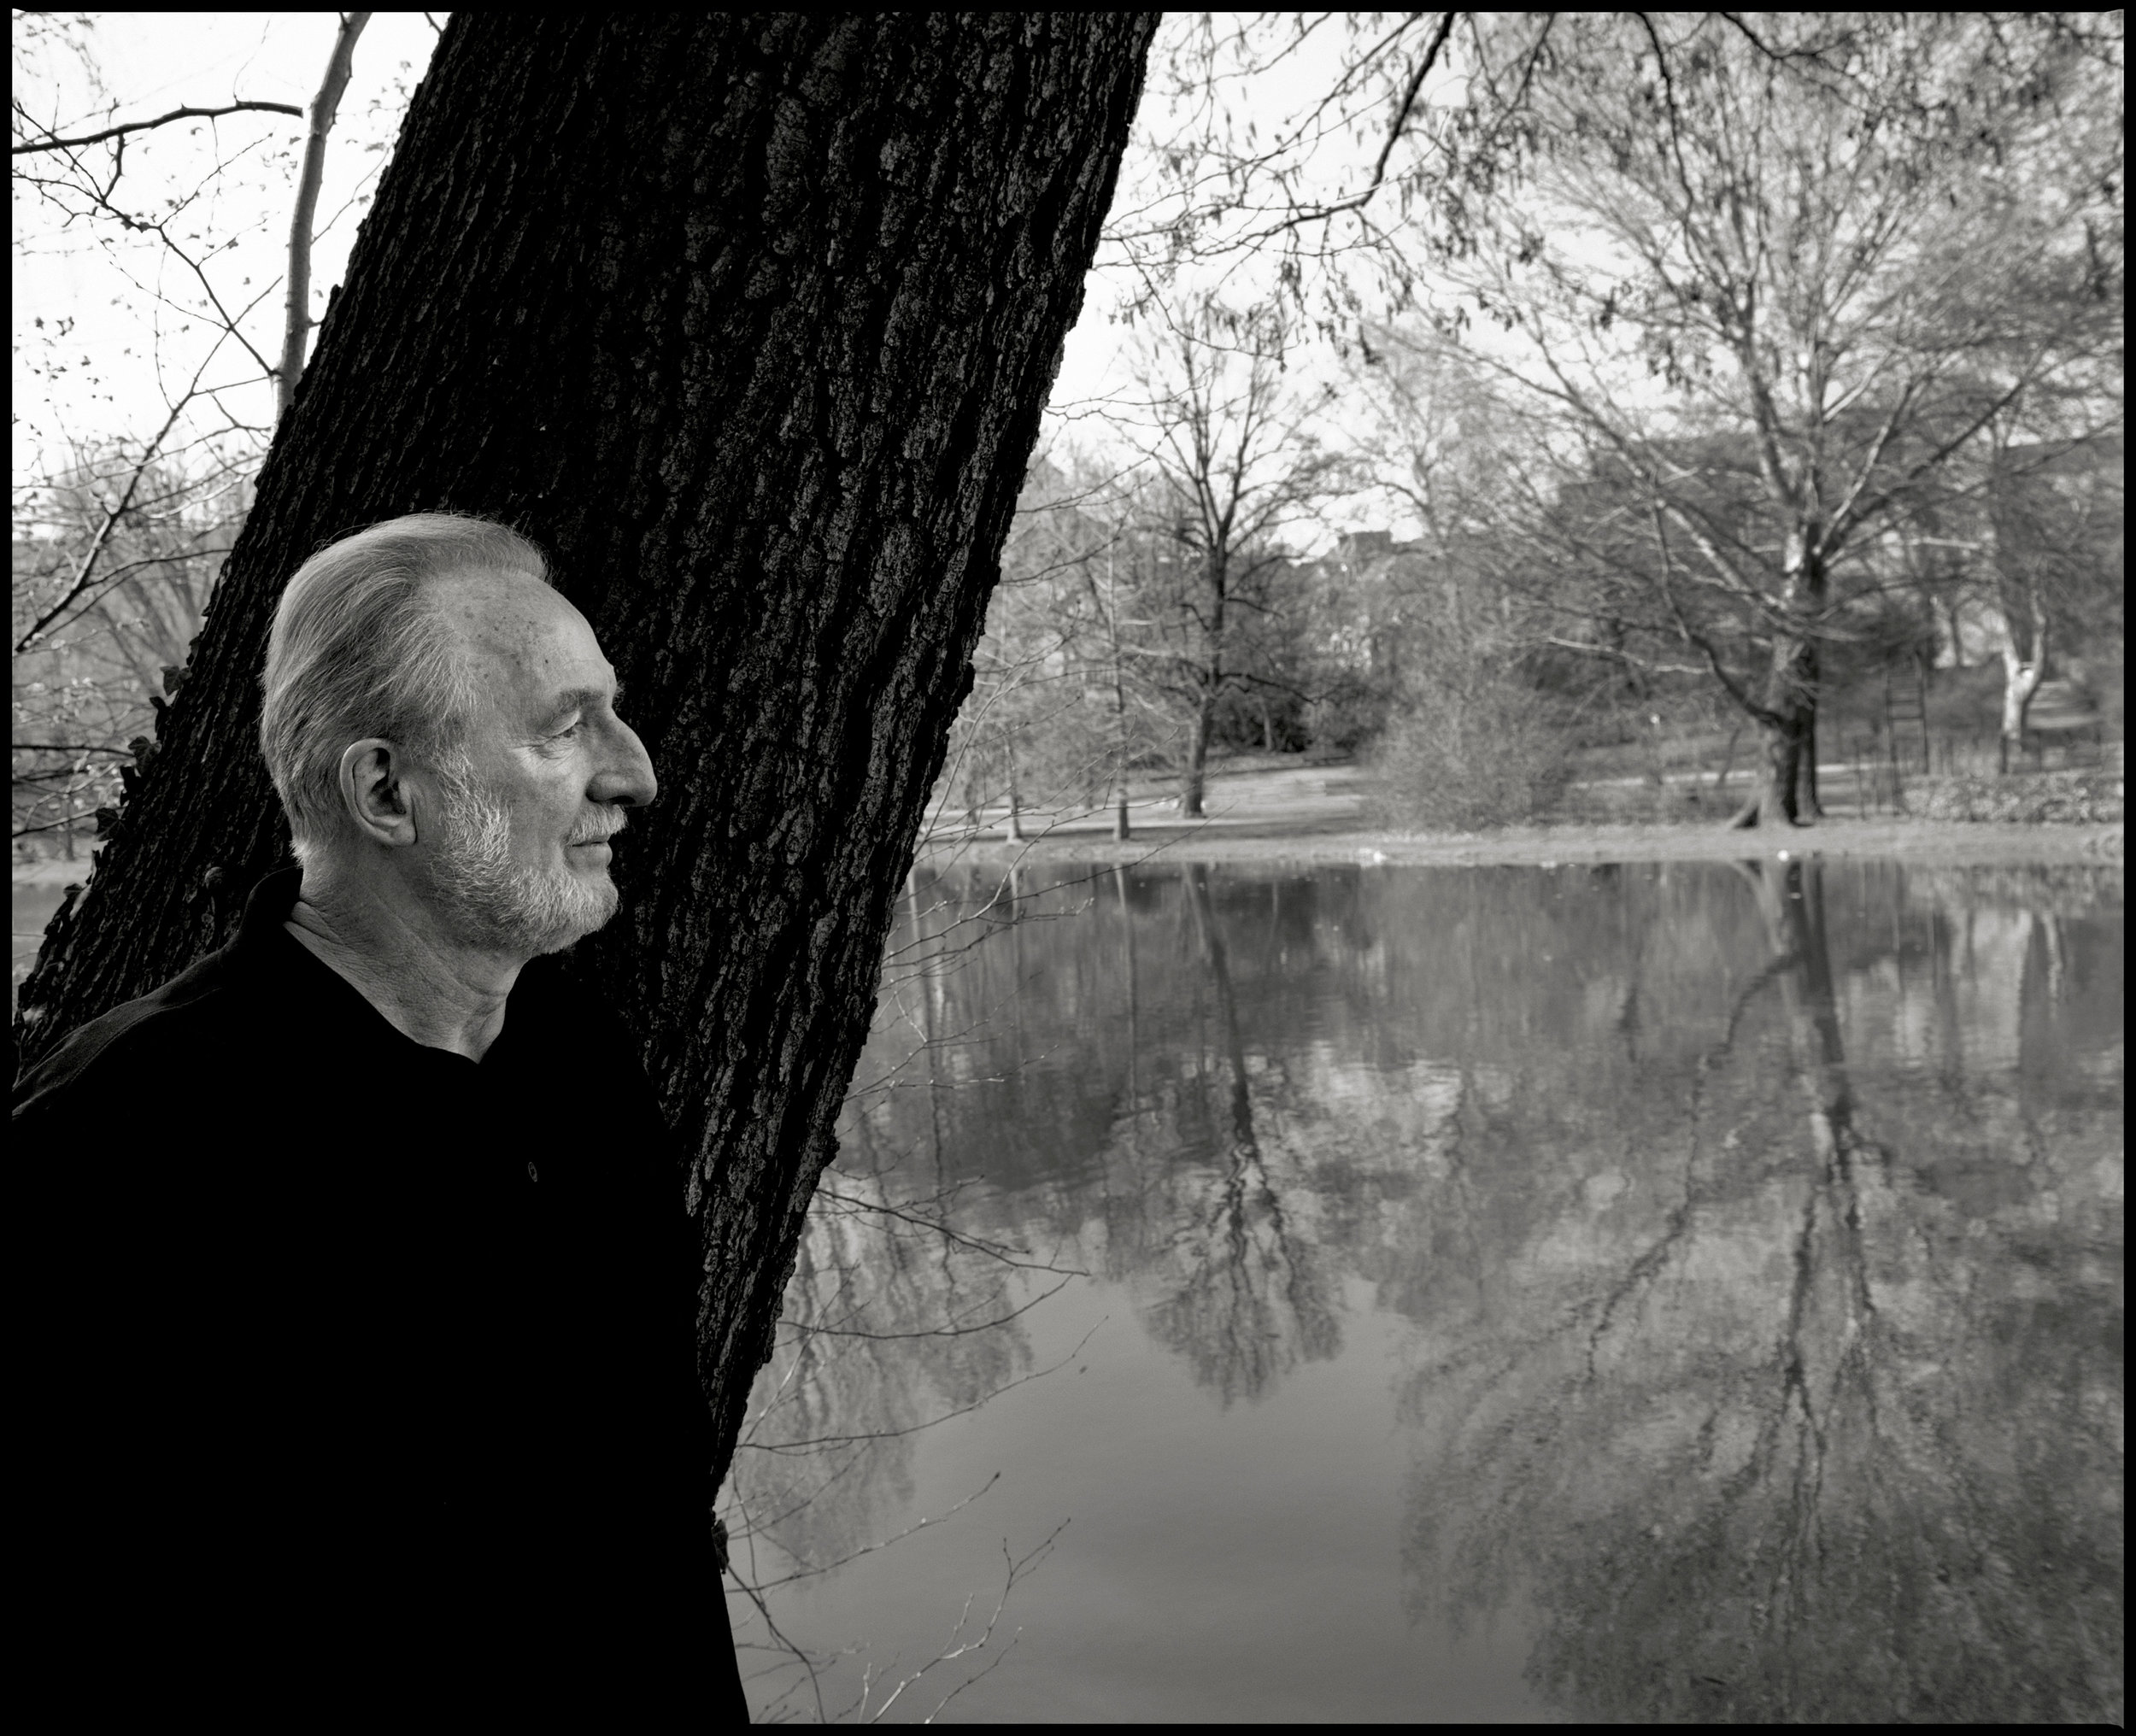 Hannes Wader - Singer, Songwriter